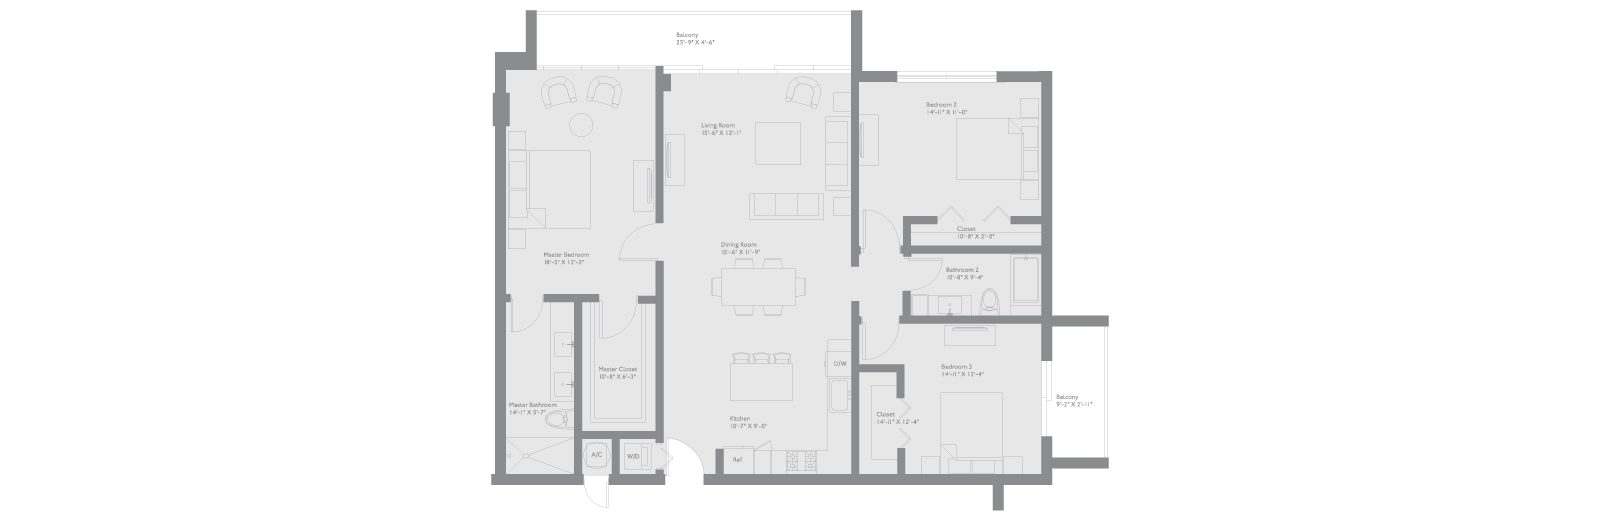 Arbor Floor Plan E 12 15 17